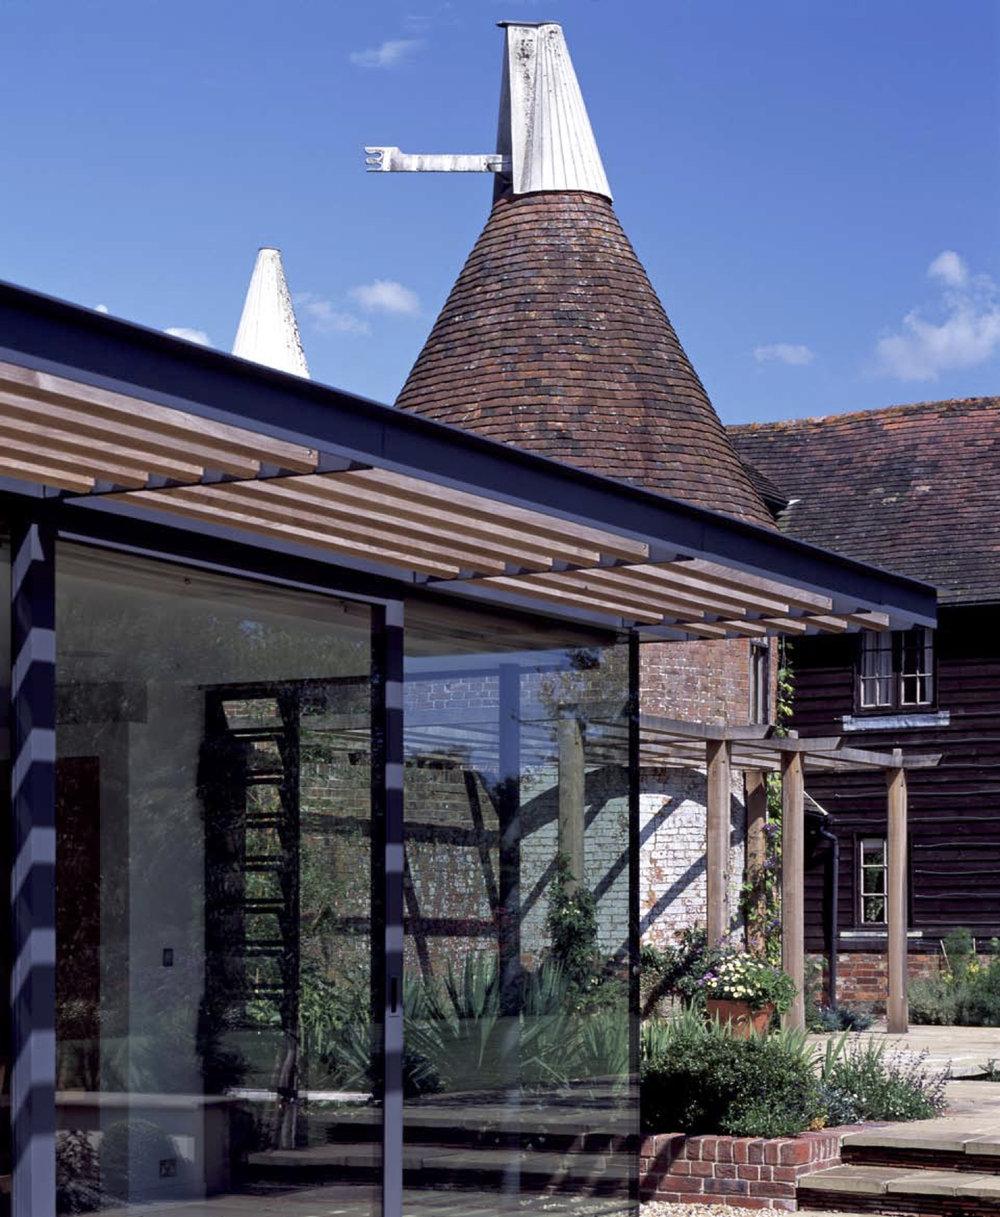 Tidebrook House